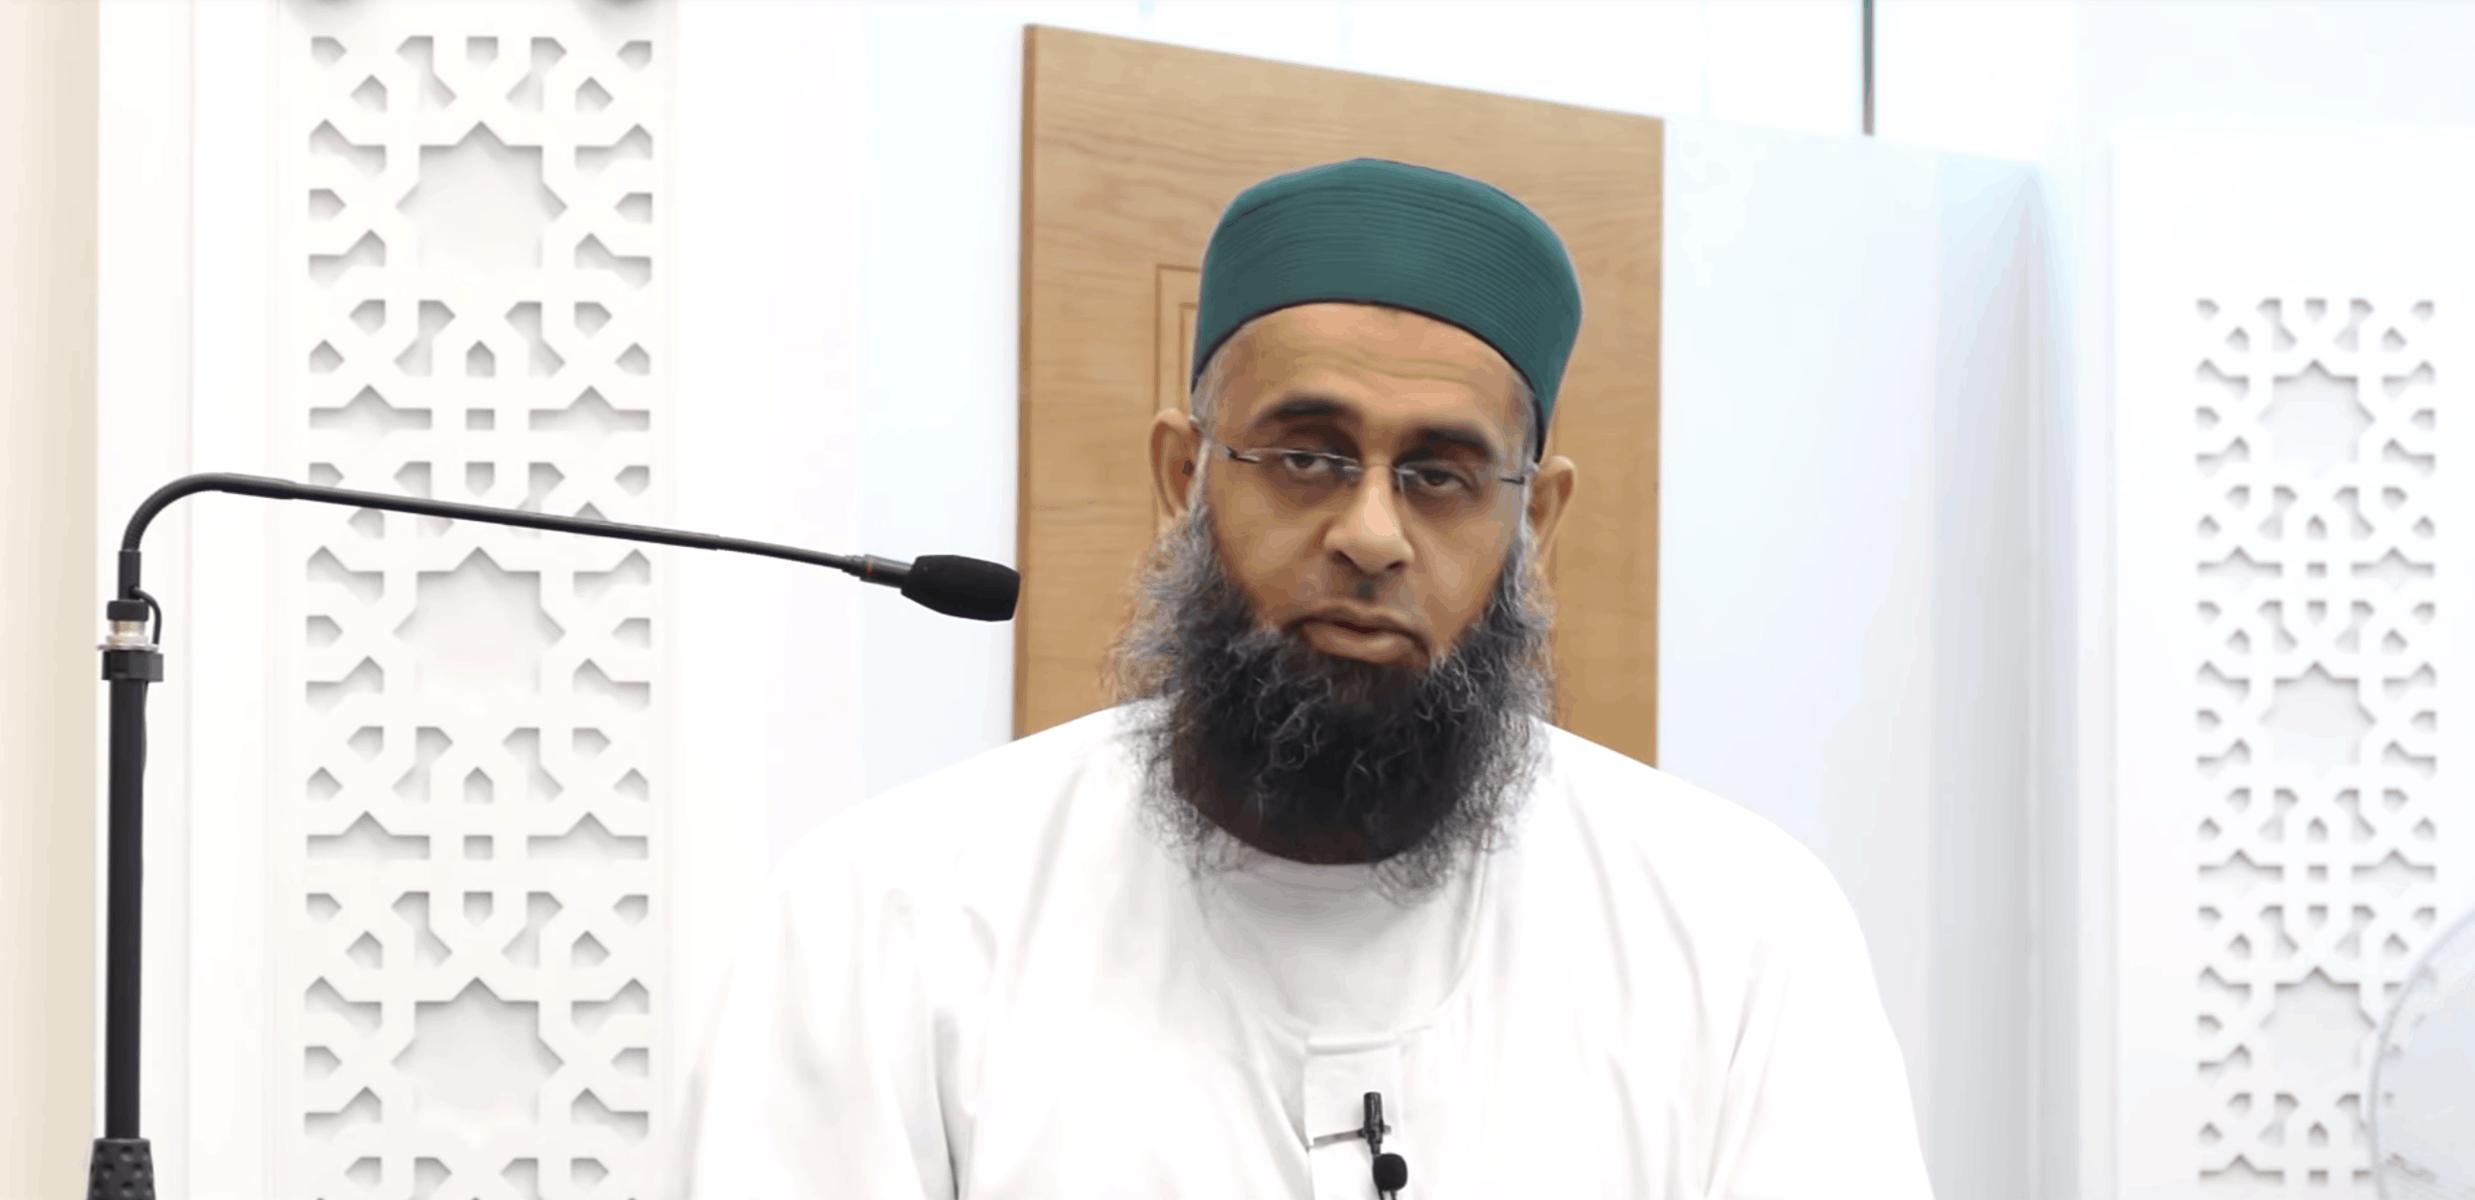 Abdur-Rahman ibn Yusuf – Keep Your Word: Avoid Over-Promising